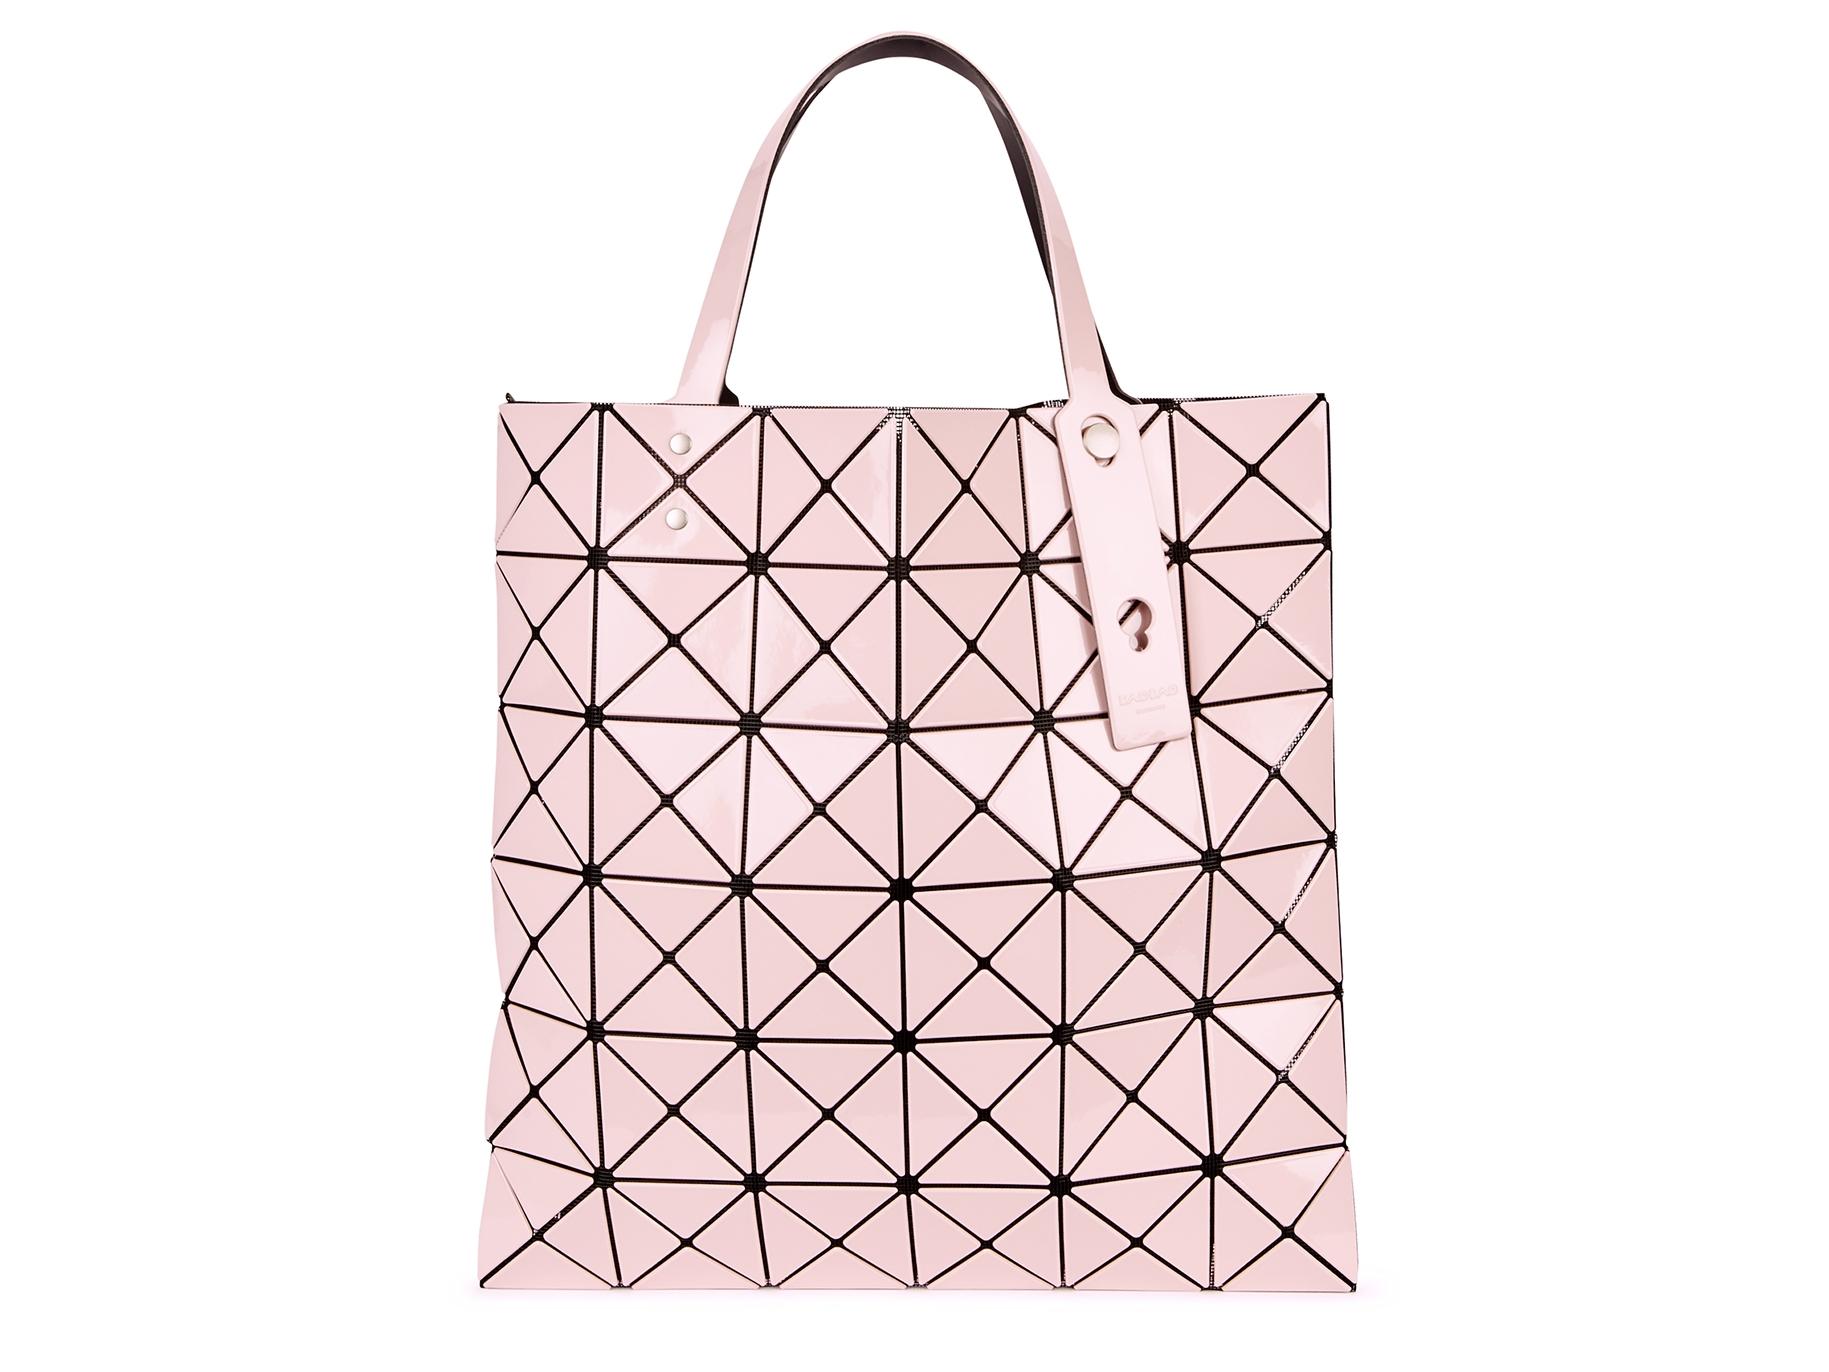 0b864f3993 BAO BAO ISSEY MIYAKE Lucent pink tote - Harvey Nichols